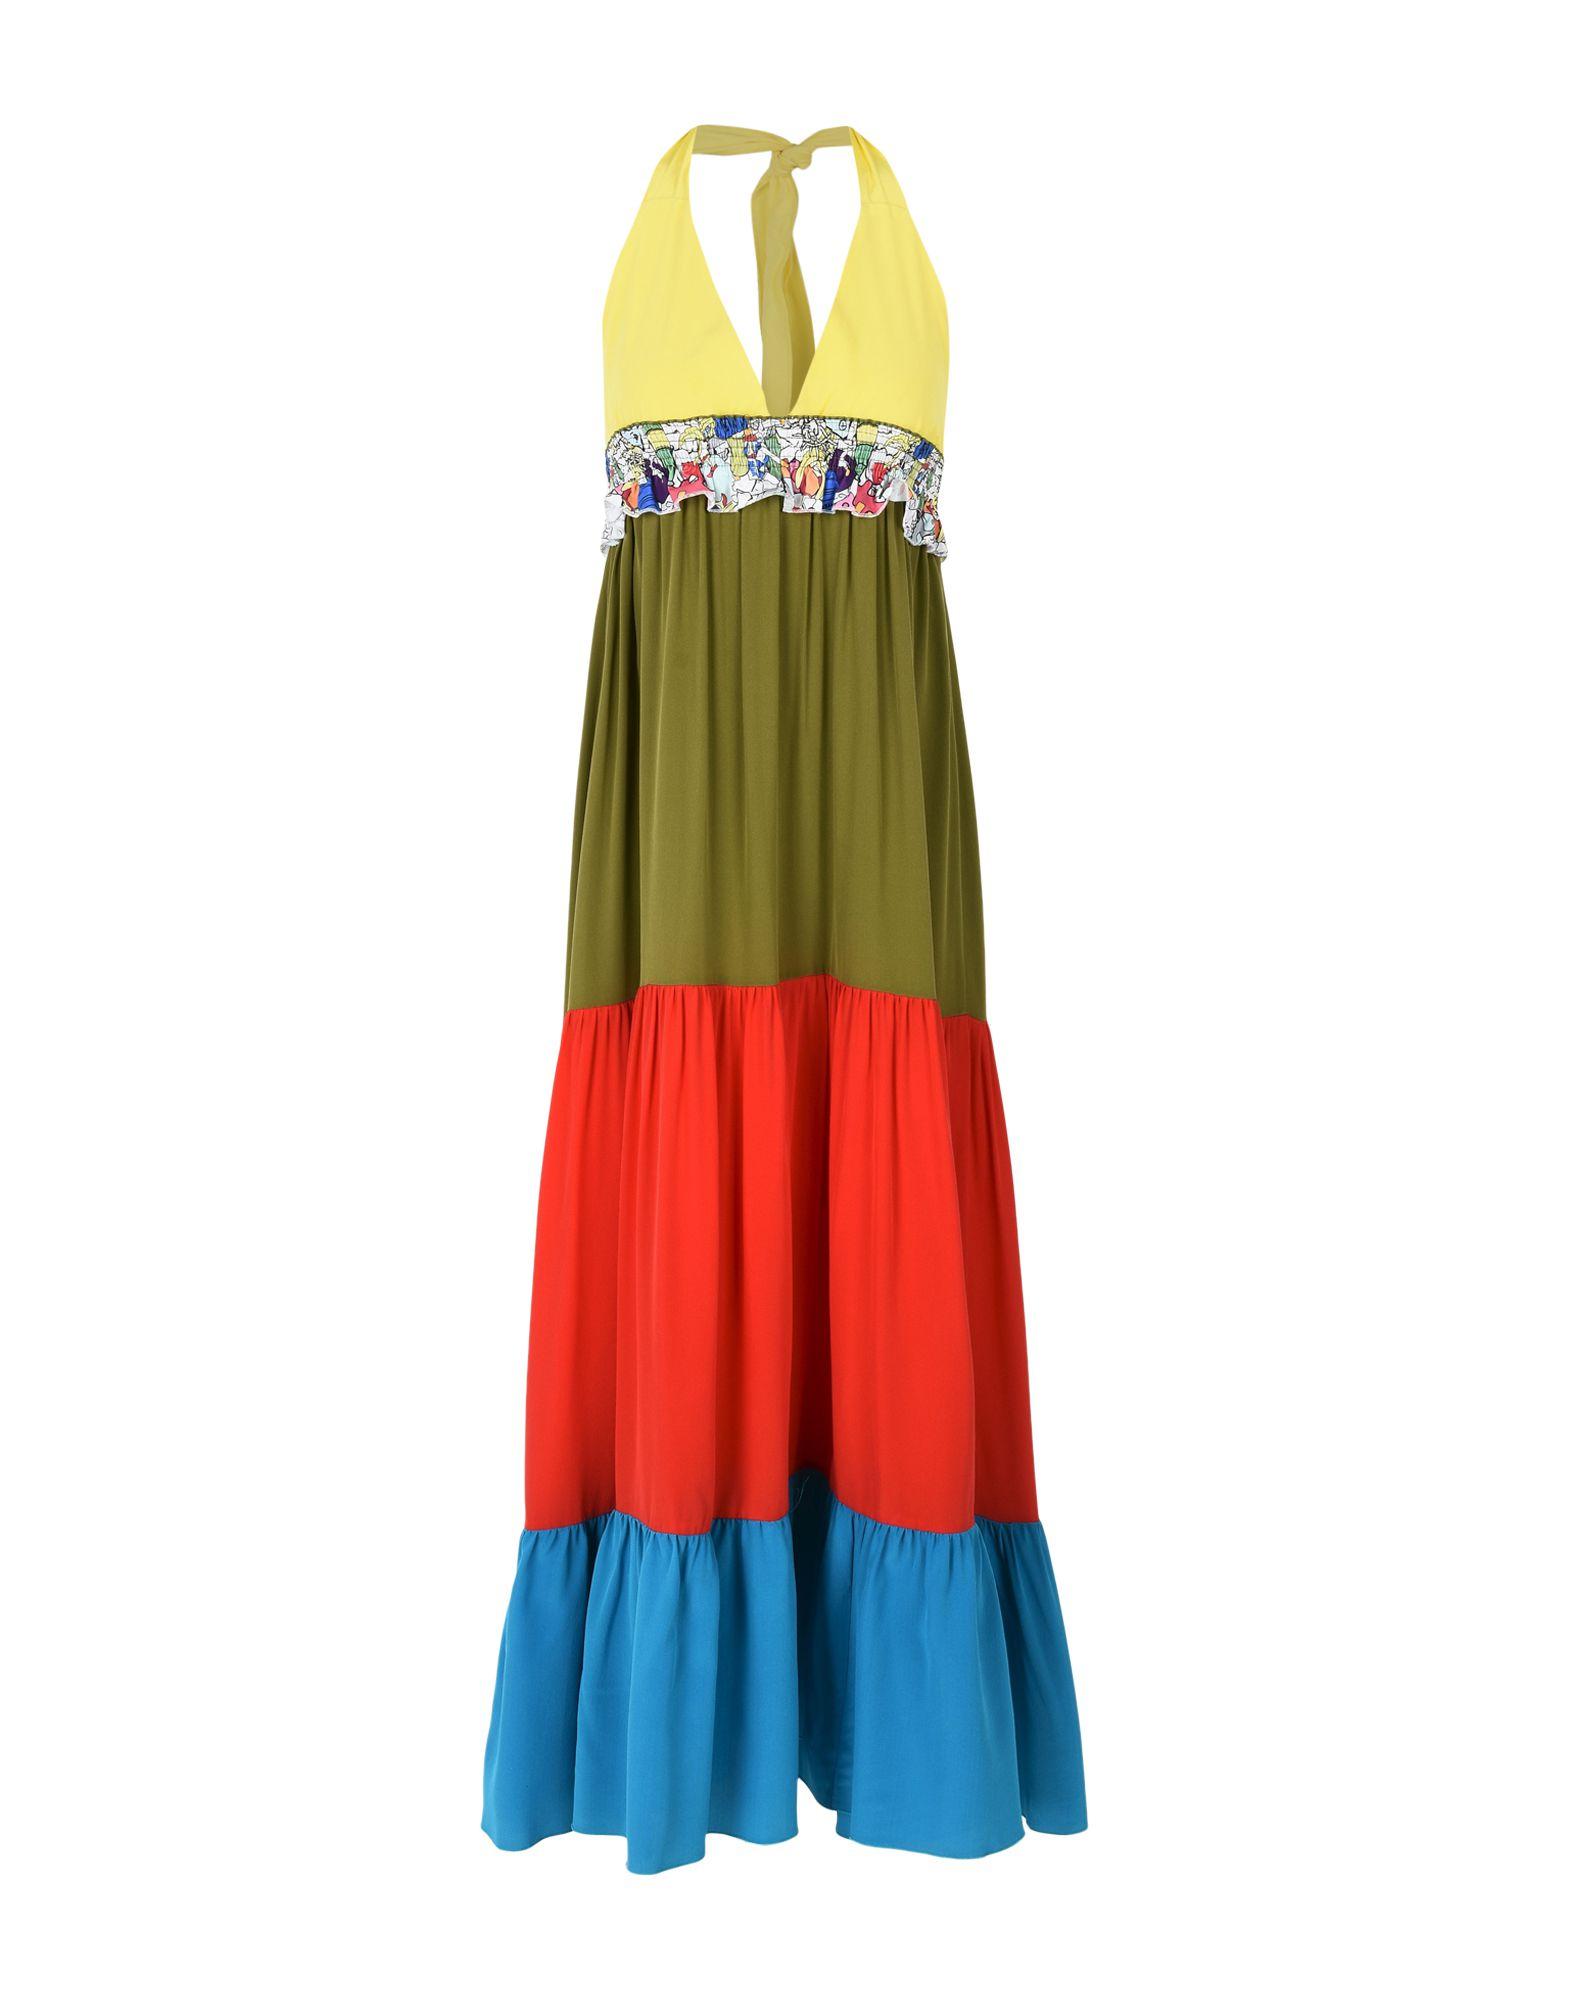 ULTRA'CHIC Длинное платье длинное платье в восточном стиле tasha martens